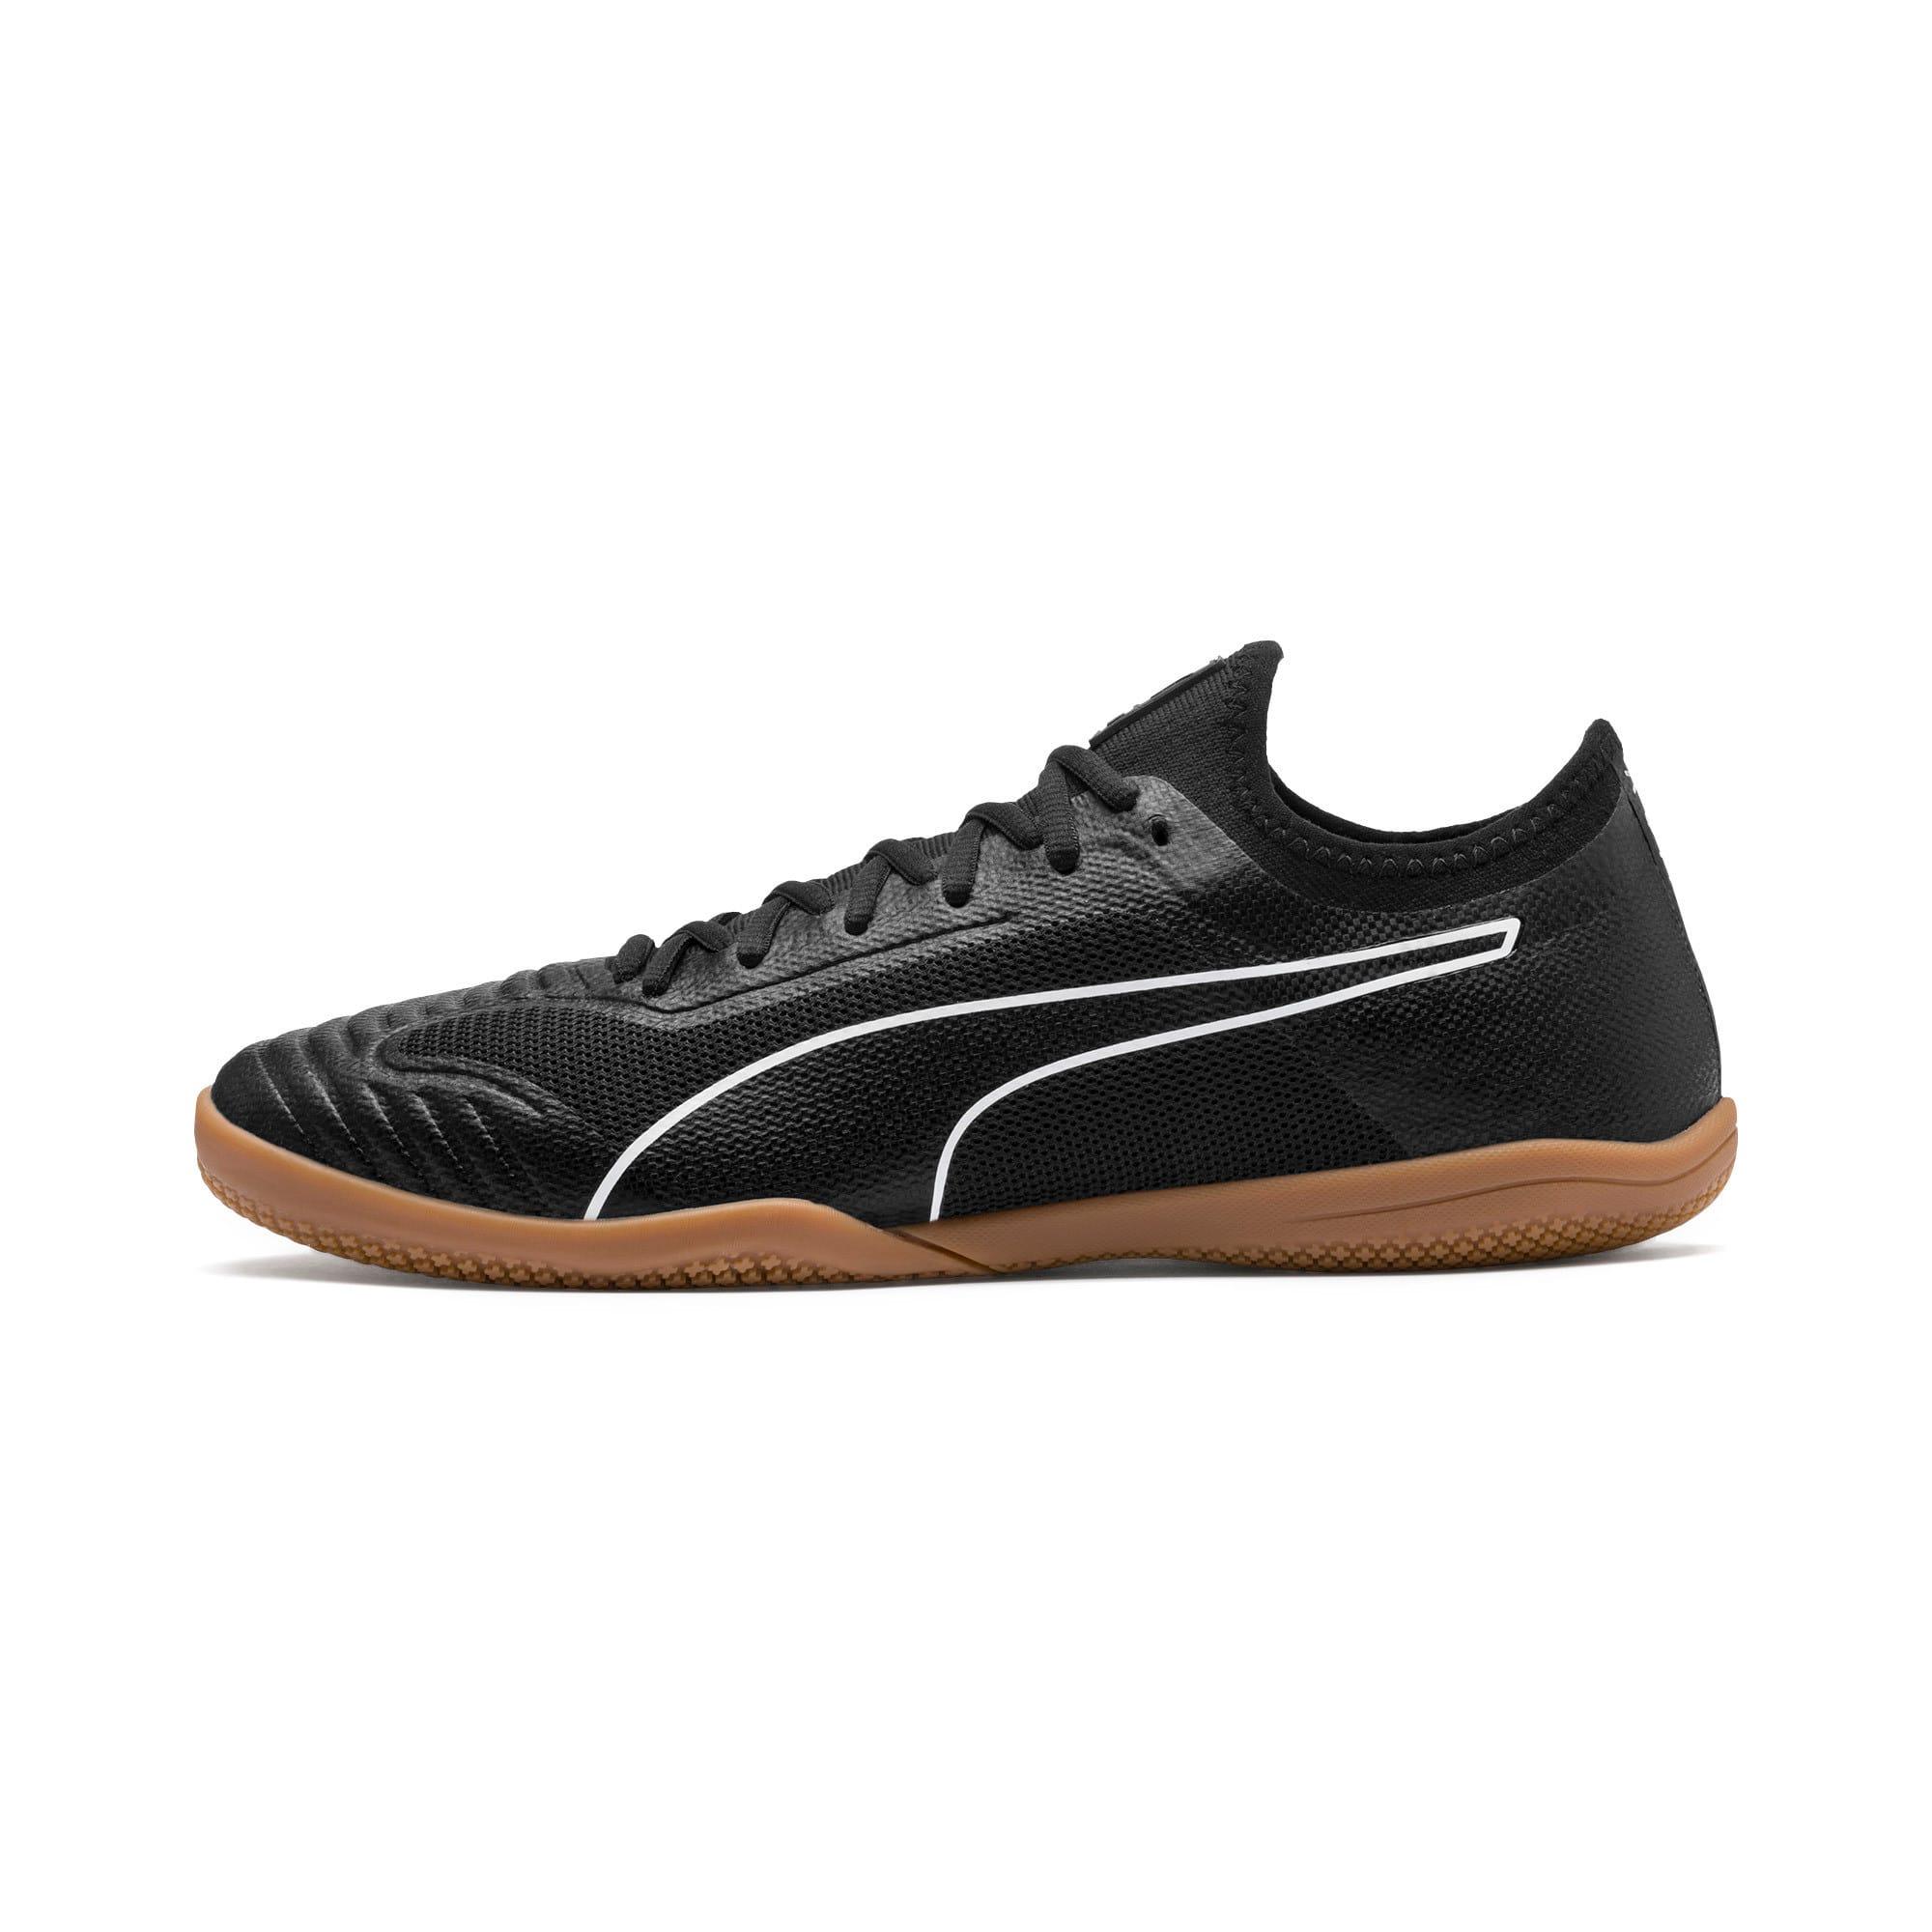 Thumbnail 1 of 365 Sala 1 Men's Football Boots, Puma Black-Puma White-Gum, medium